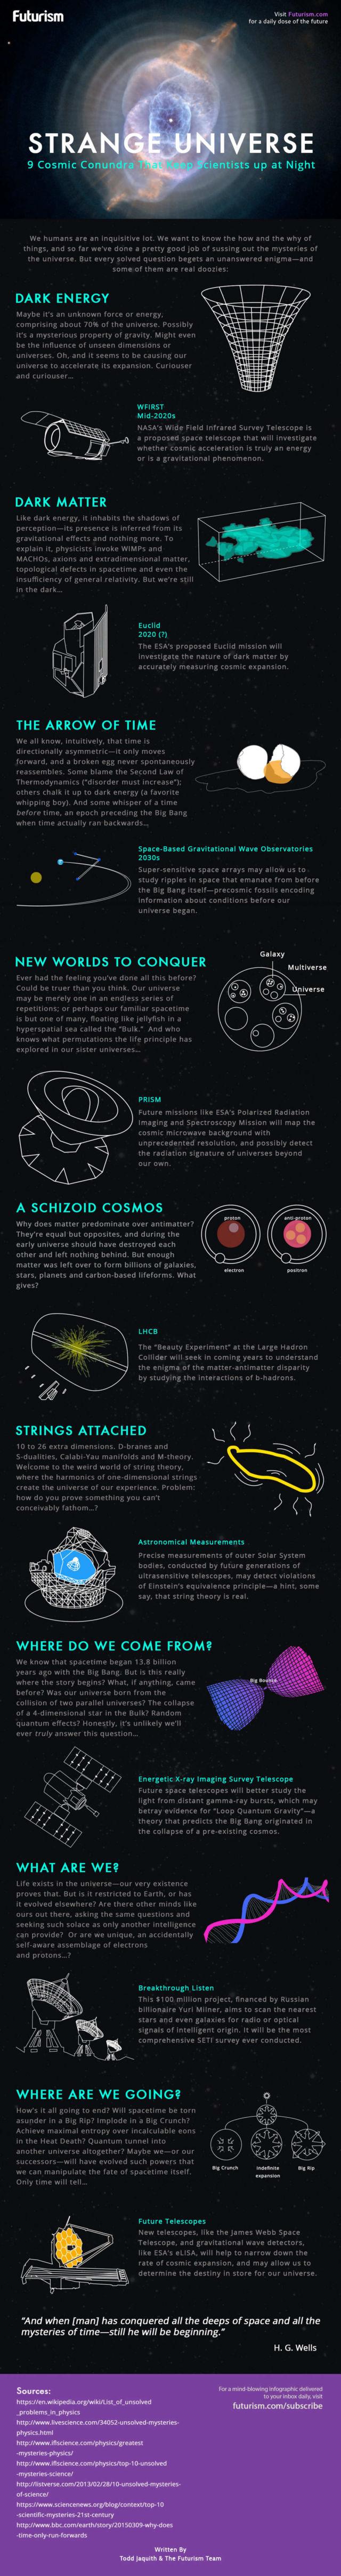 9 Physics questions baffling scientists